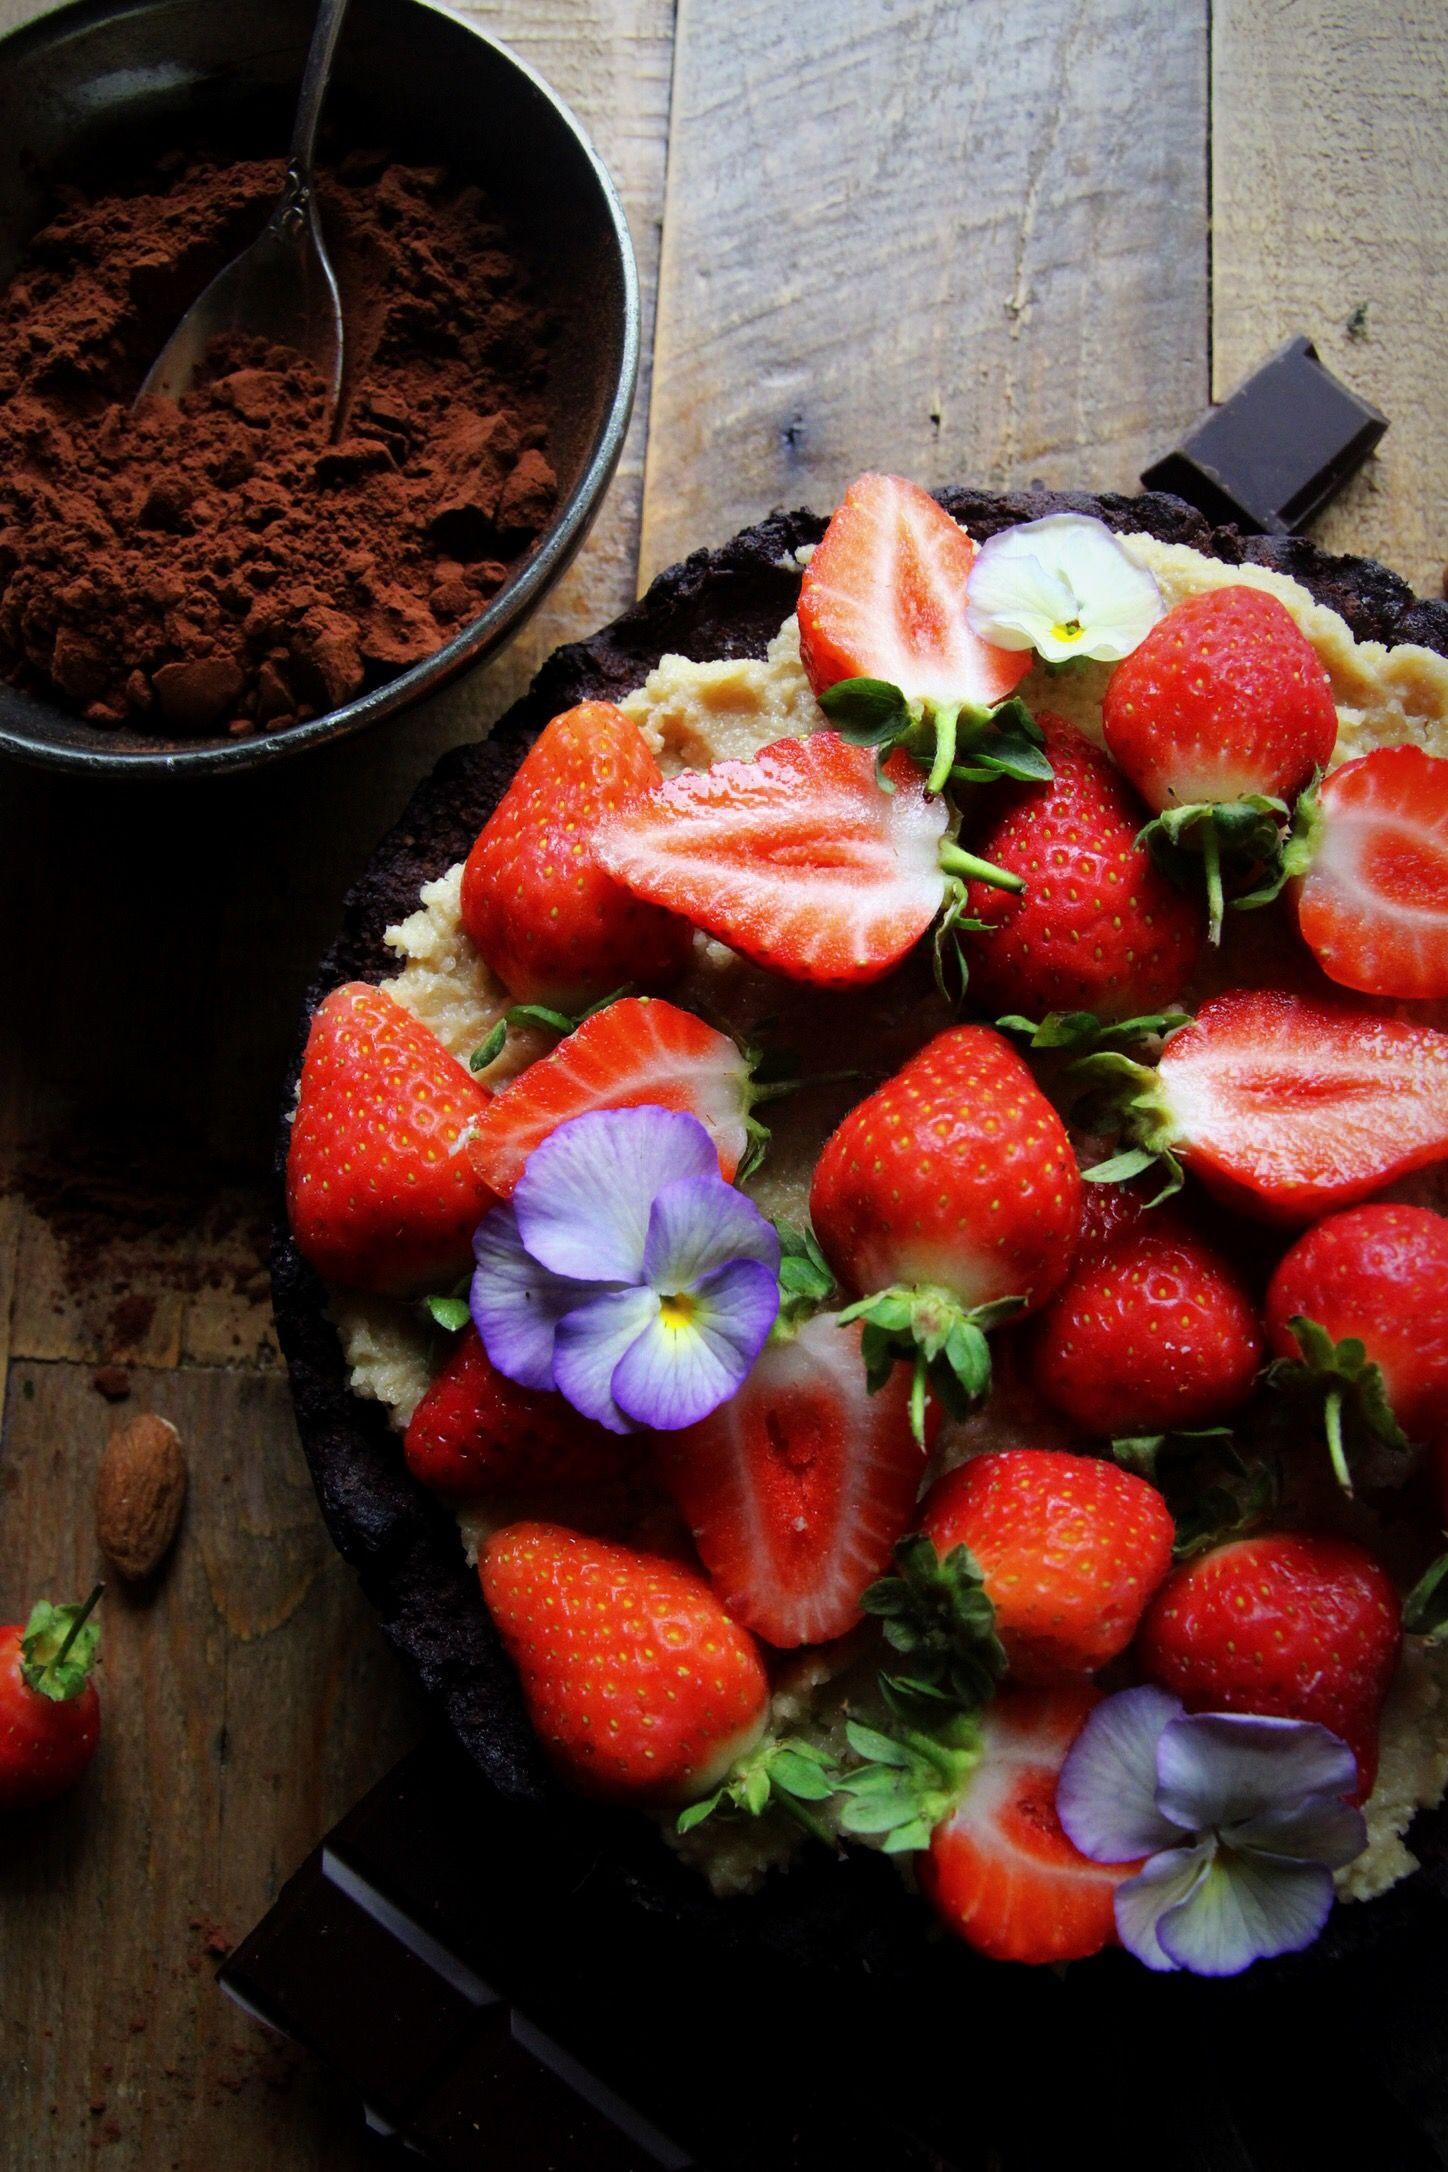 Flourless Chocolate, Almond and Chestnut Brownie Cake (Vegan & Gluten Free)